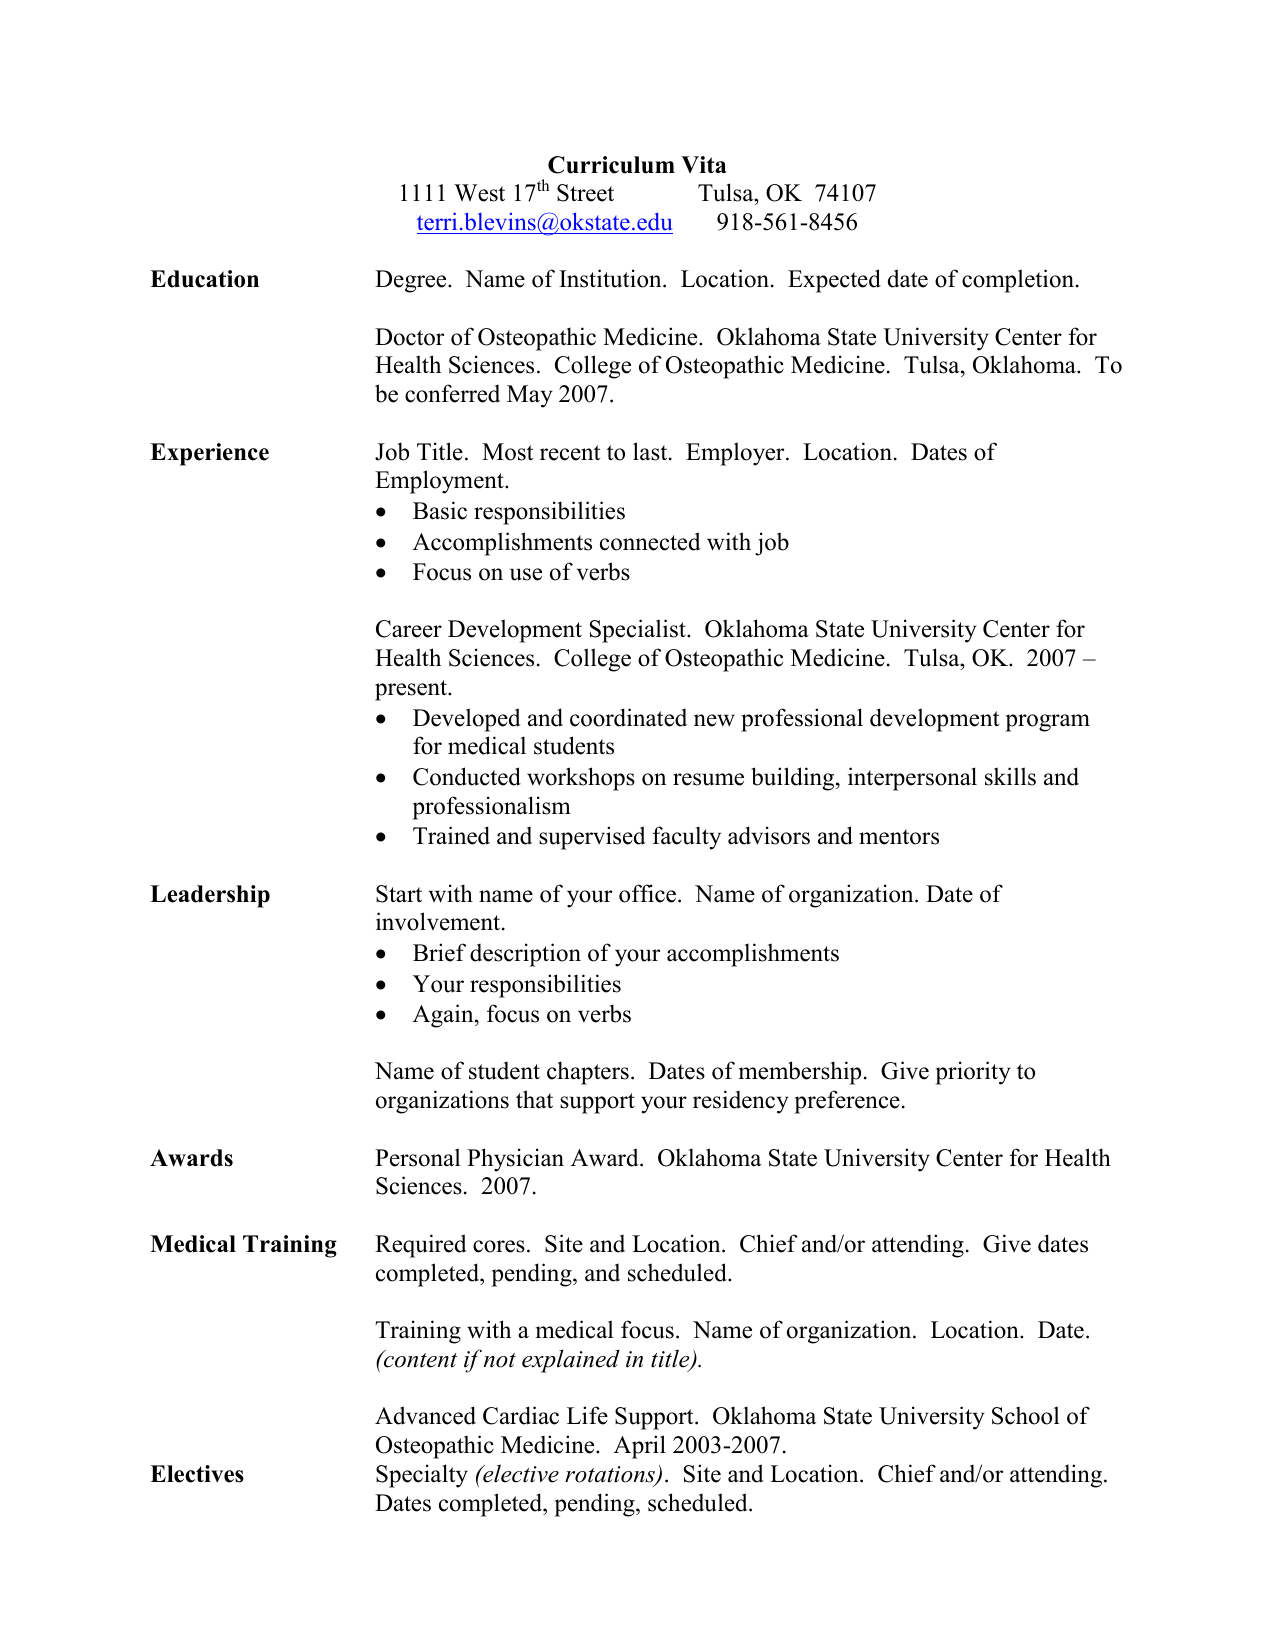 Curriculum Vita - Oklahoma State University Center for Health